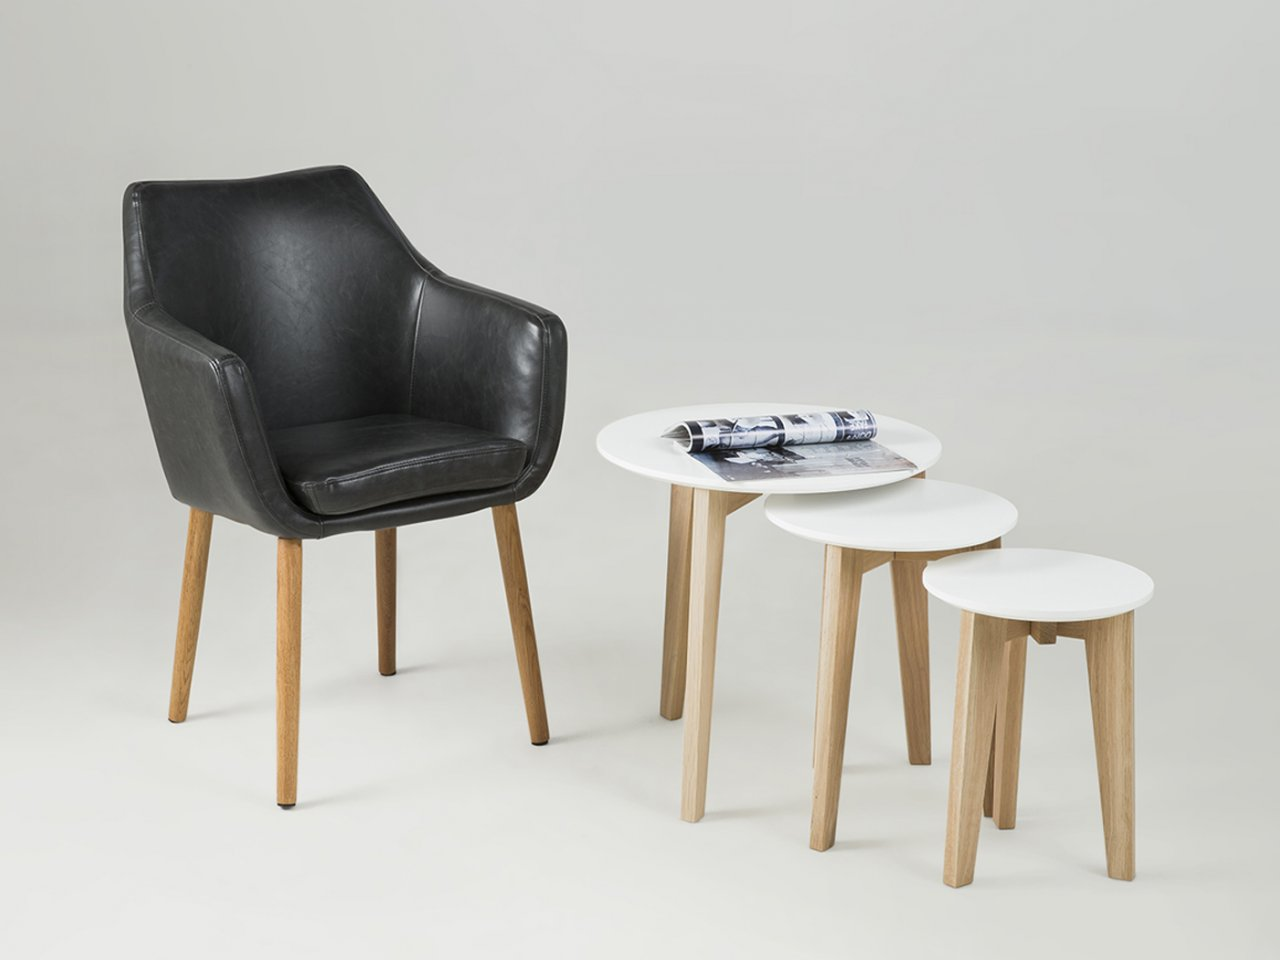 Sedia con braccioli Finalborgo - v37